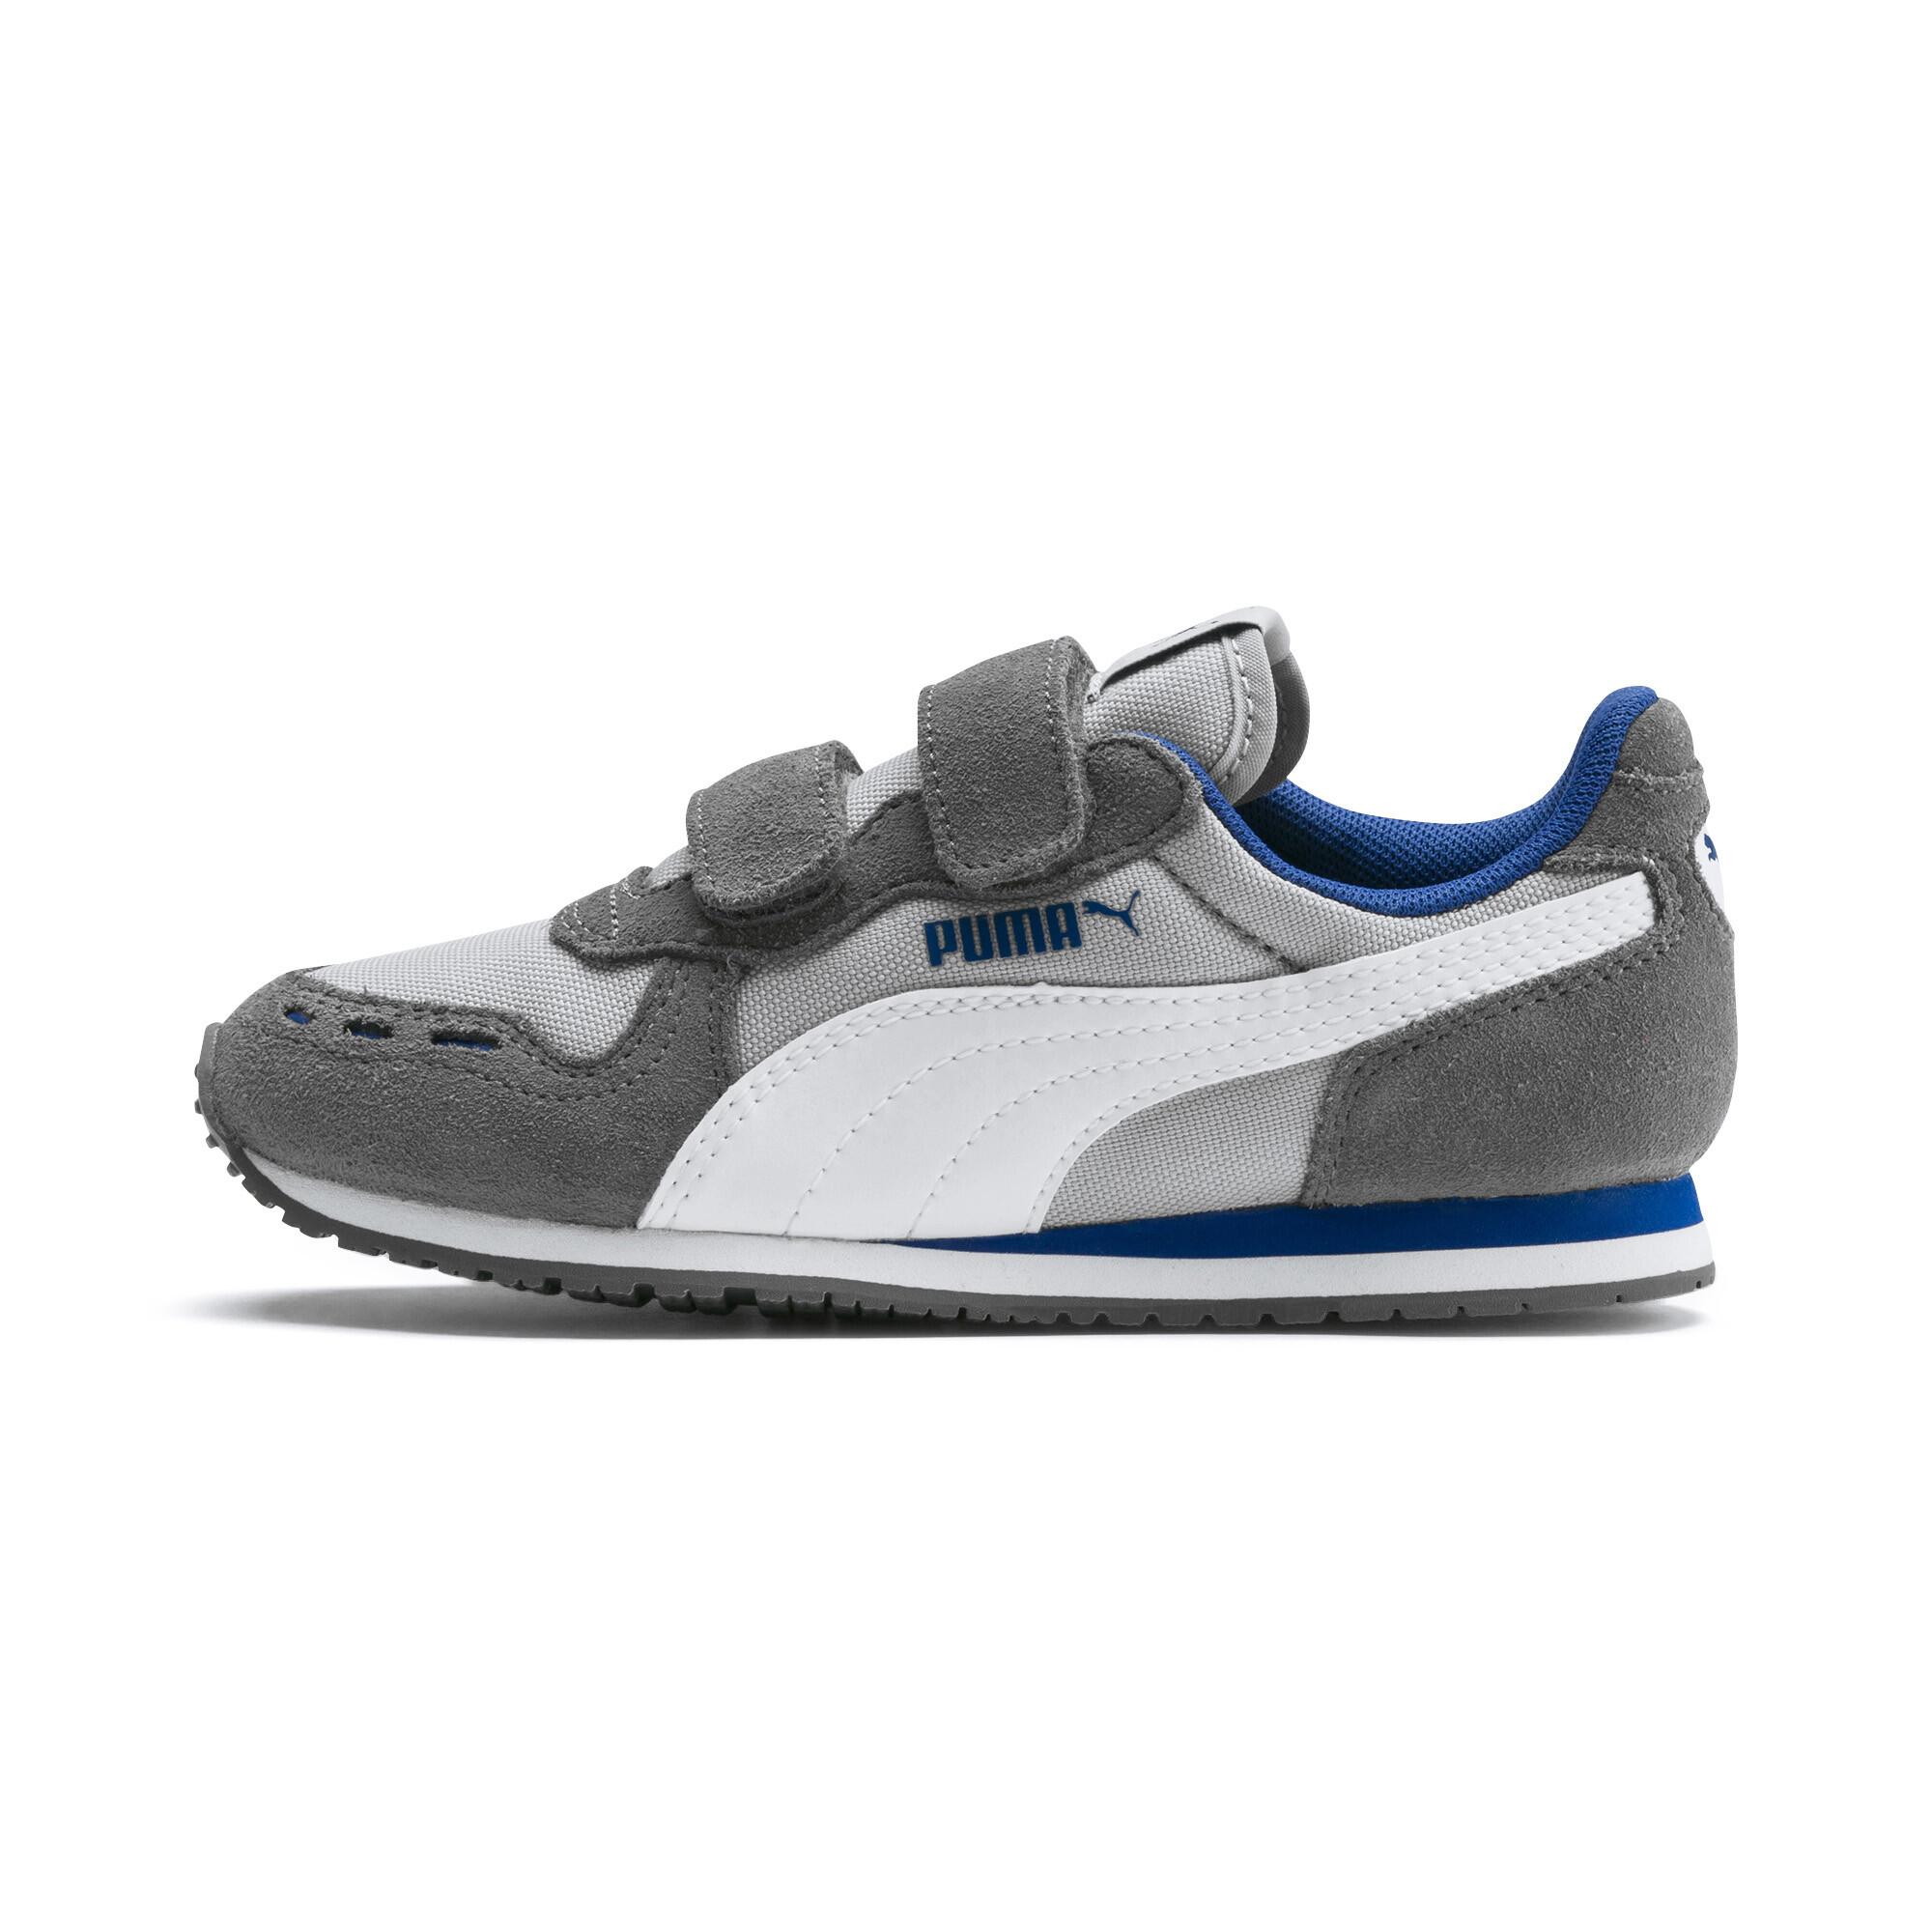 PUMA-Cabana-Racer-Little-Kids-039-Shoes-Kids-Shoe-Kids thumbnail 10